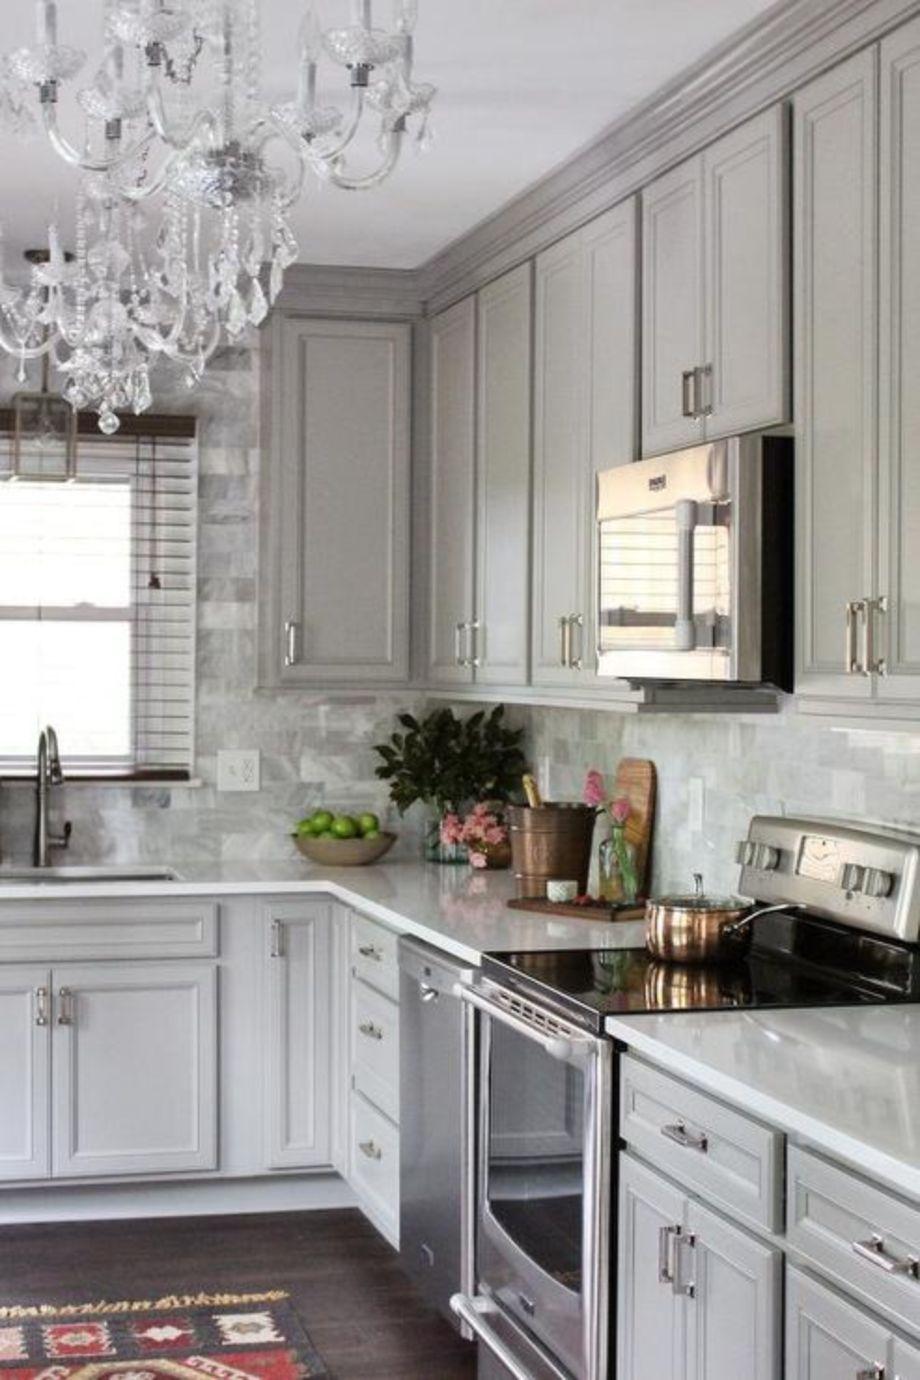 Cool Grey Kitchen Cabinet Ideas 06 Kitchen Renovation New